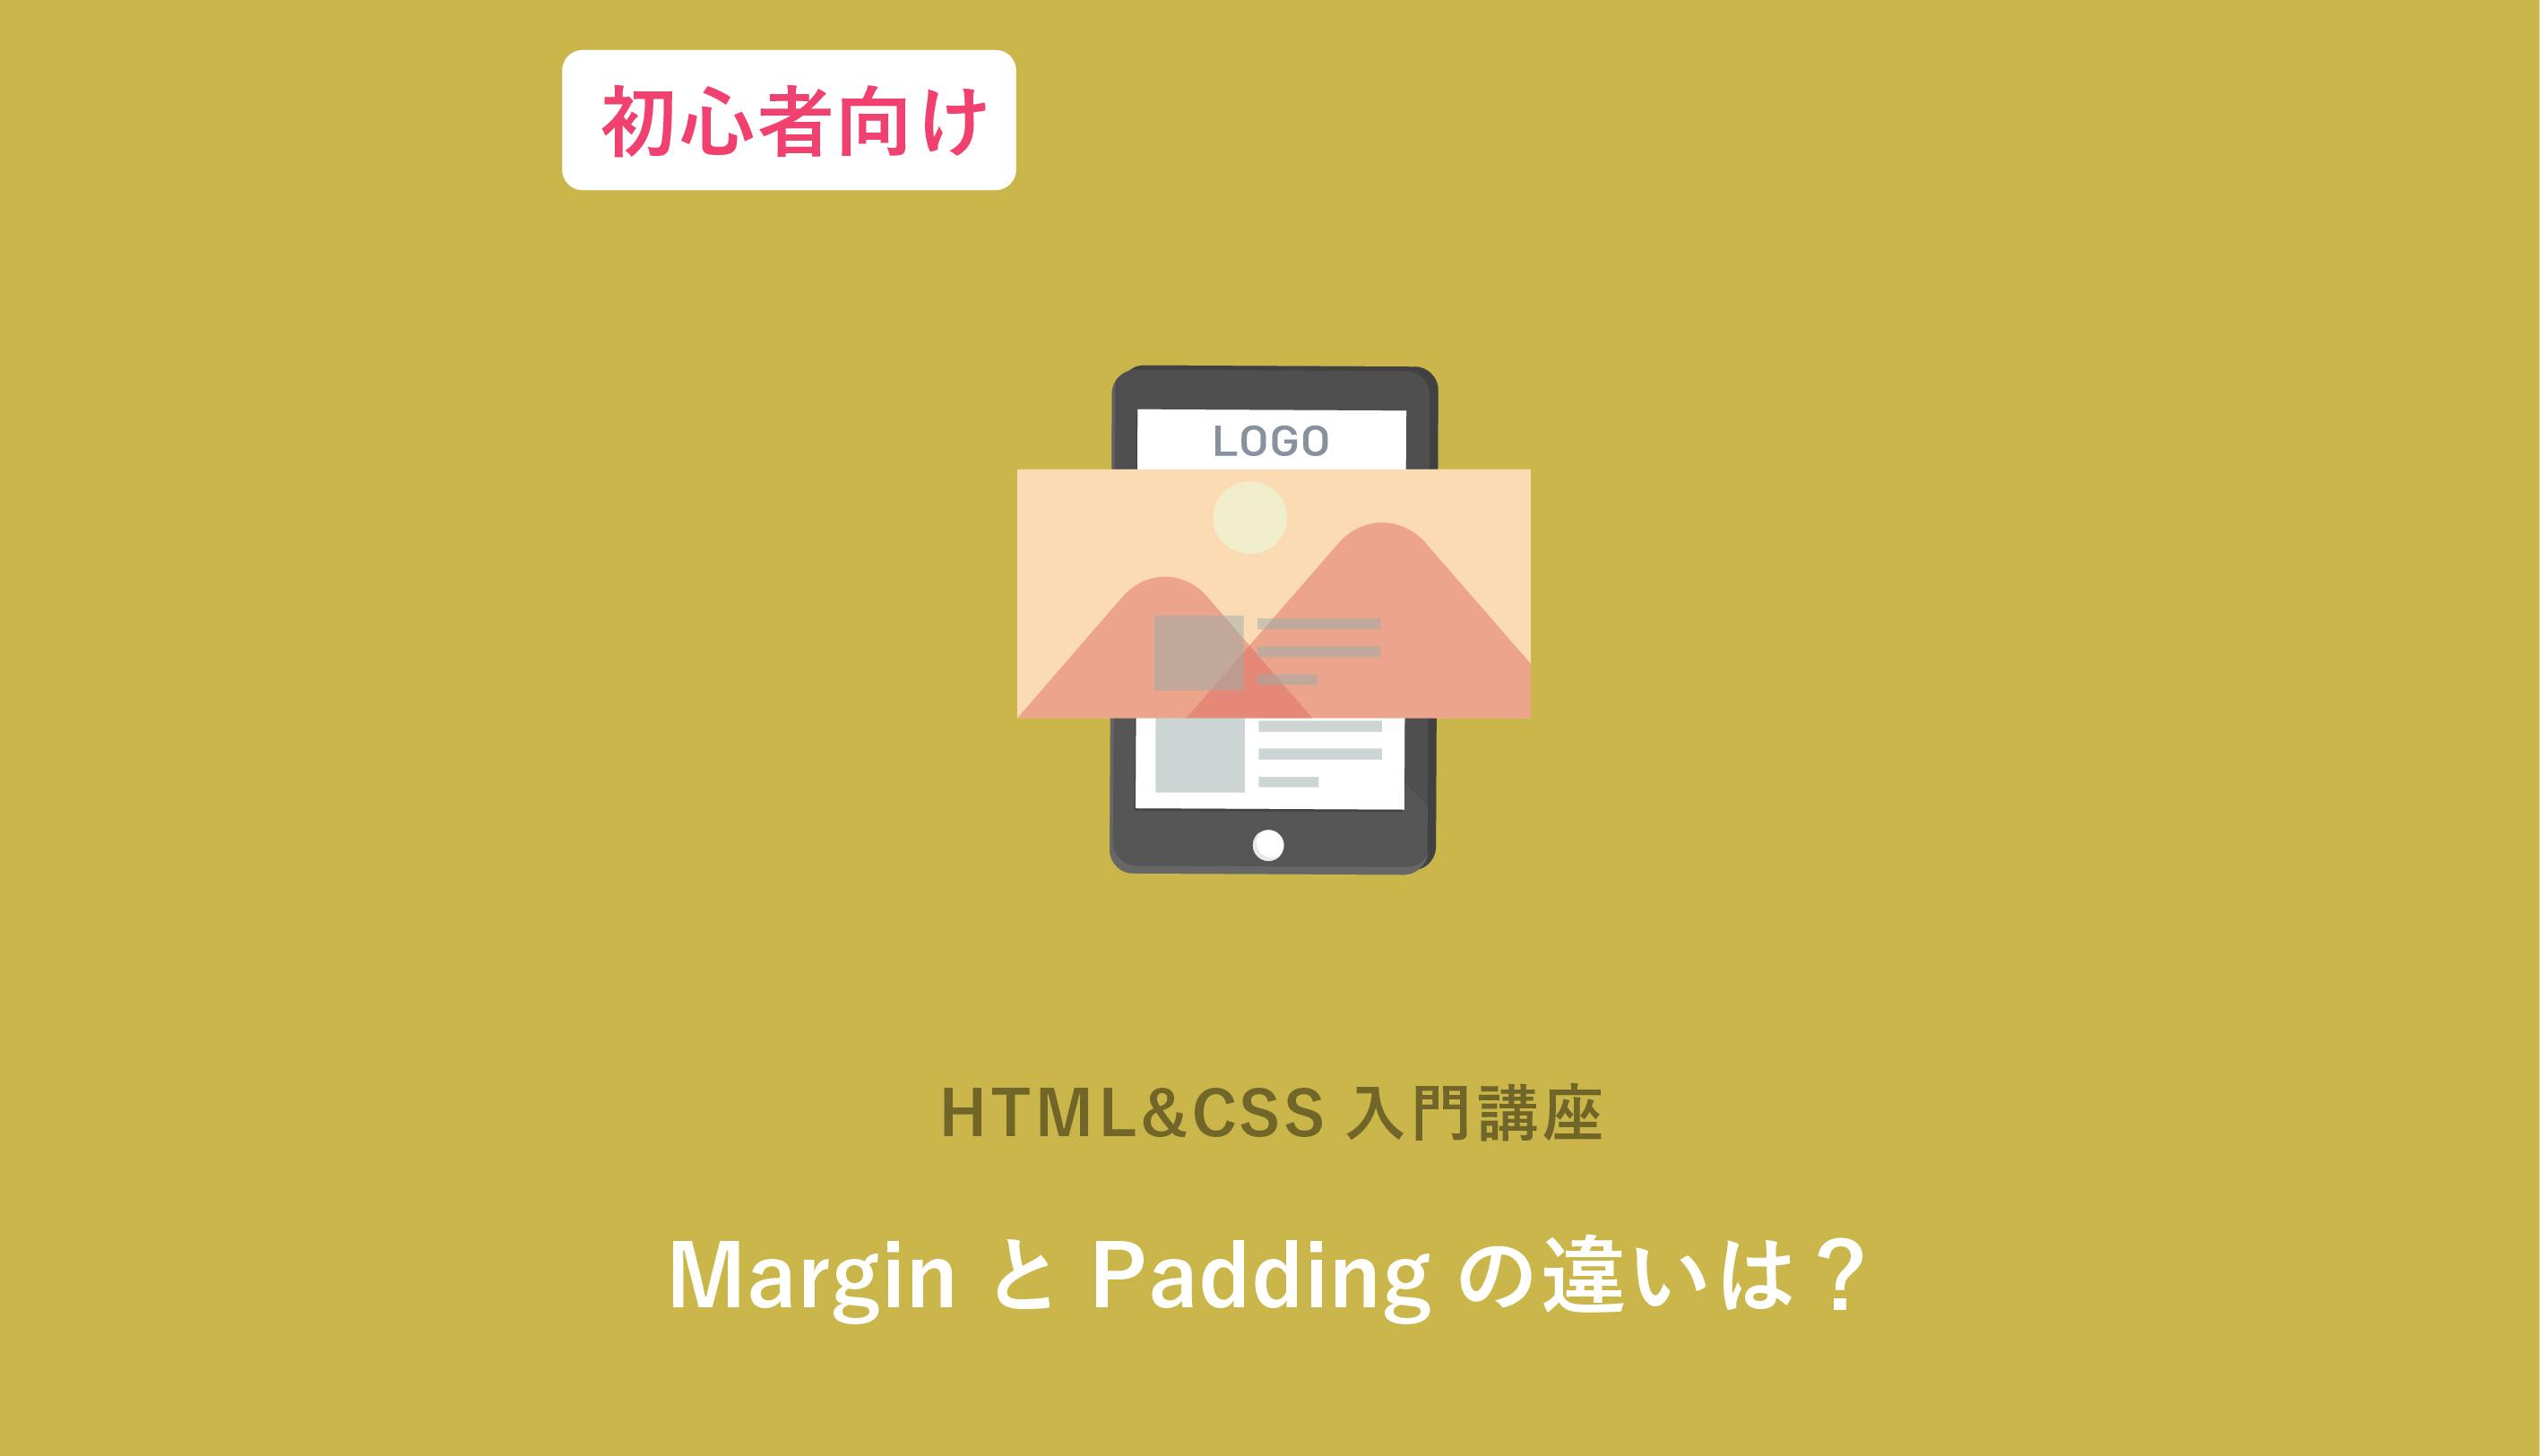 CSS【paddingとmarginの使い分け】余白の作り方を徹底解説!